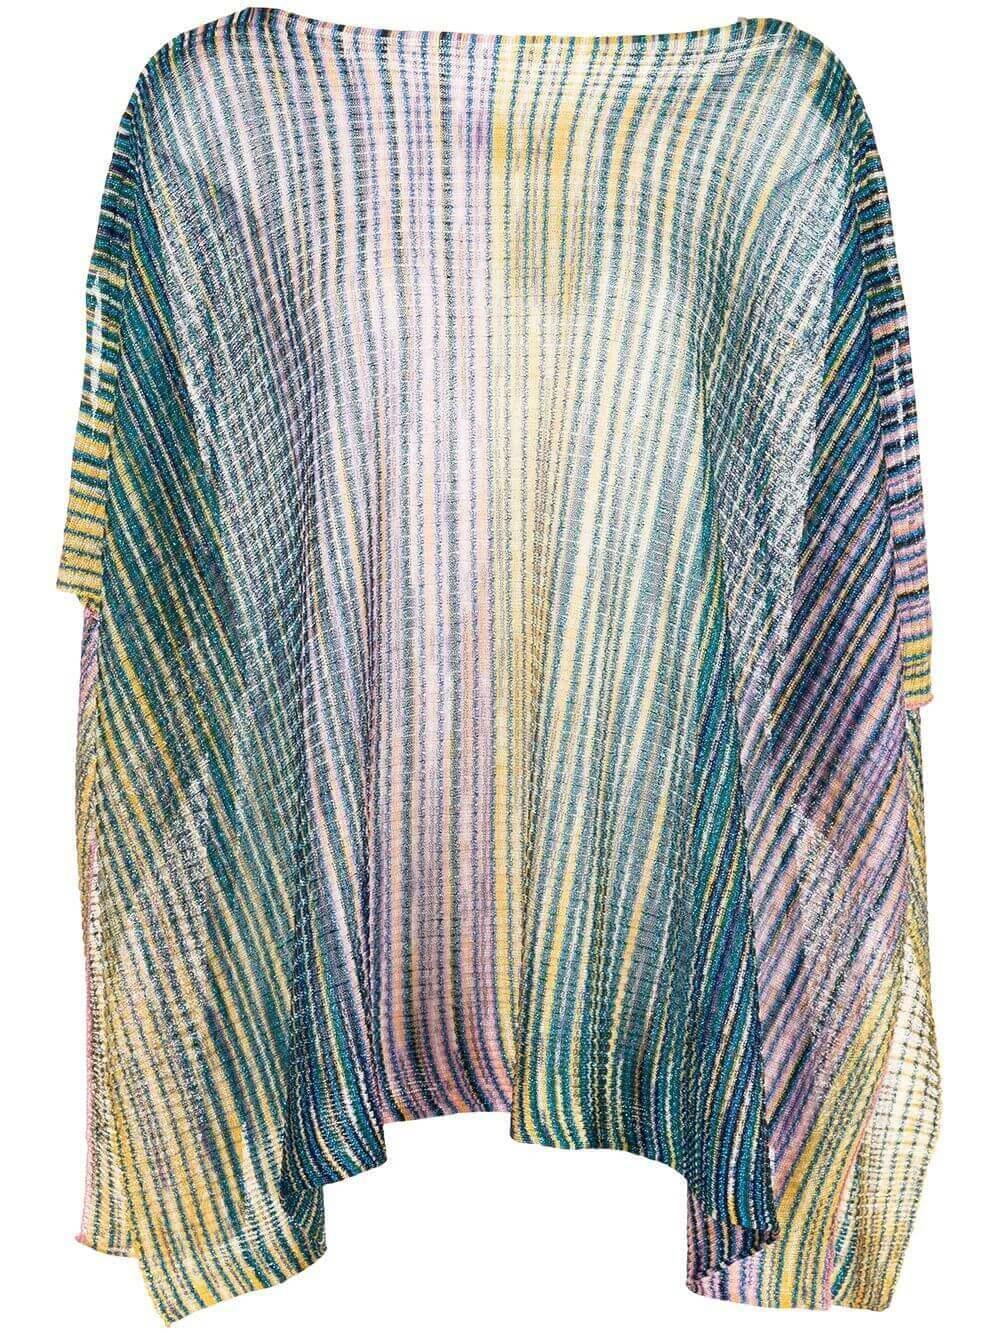 Striped Poncho Item # EP1FVMD7919